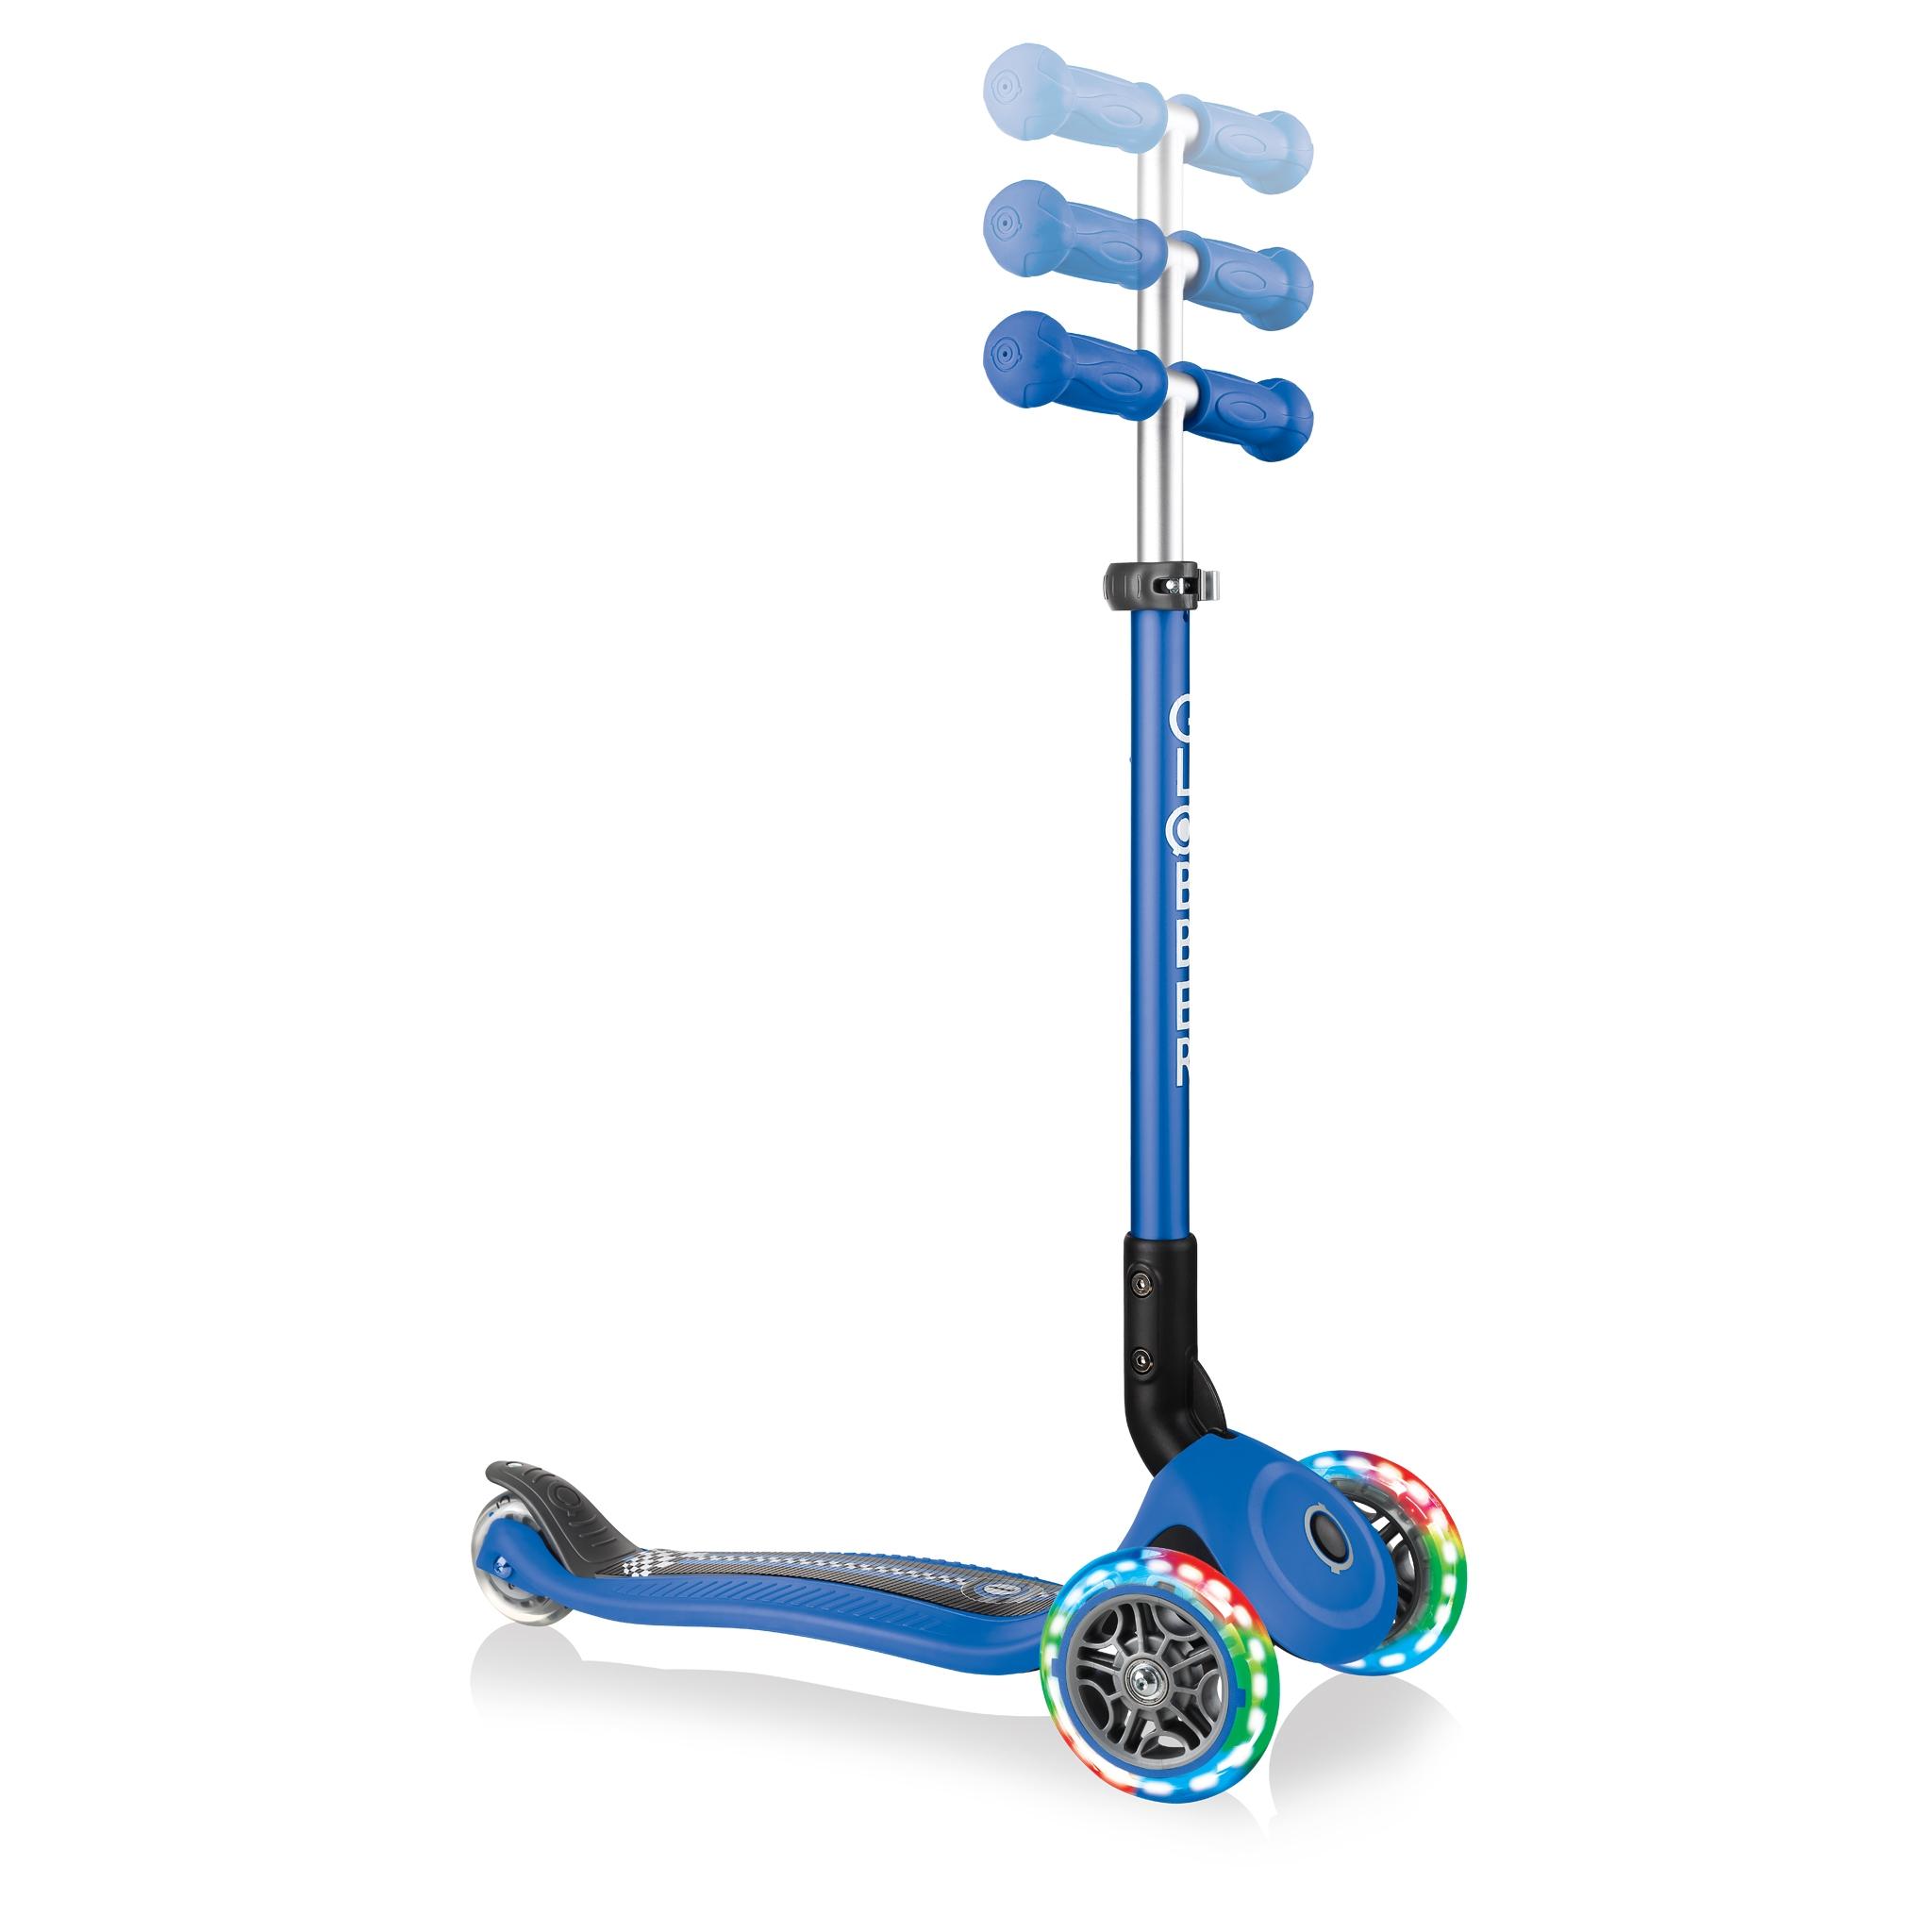 primo-foldable-fantasy-lights-3-wheel-light-up-scooter-with-adjustable-T-bar 3